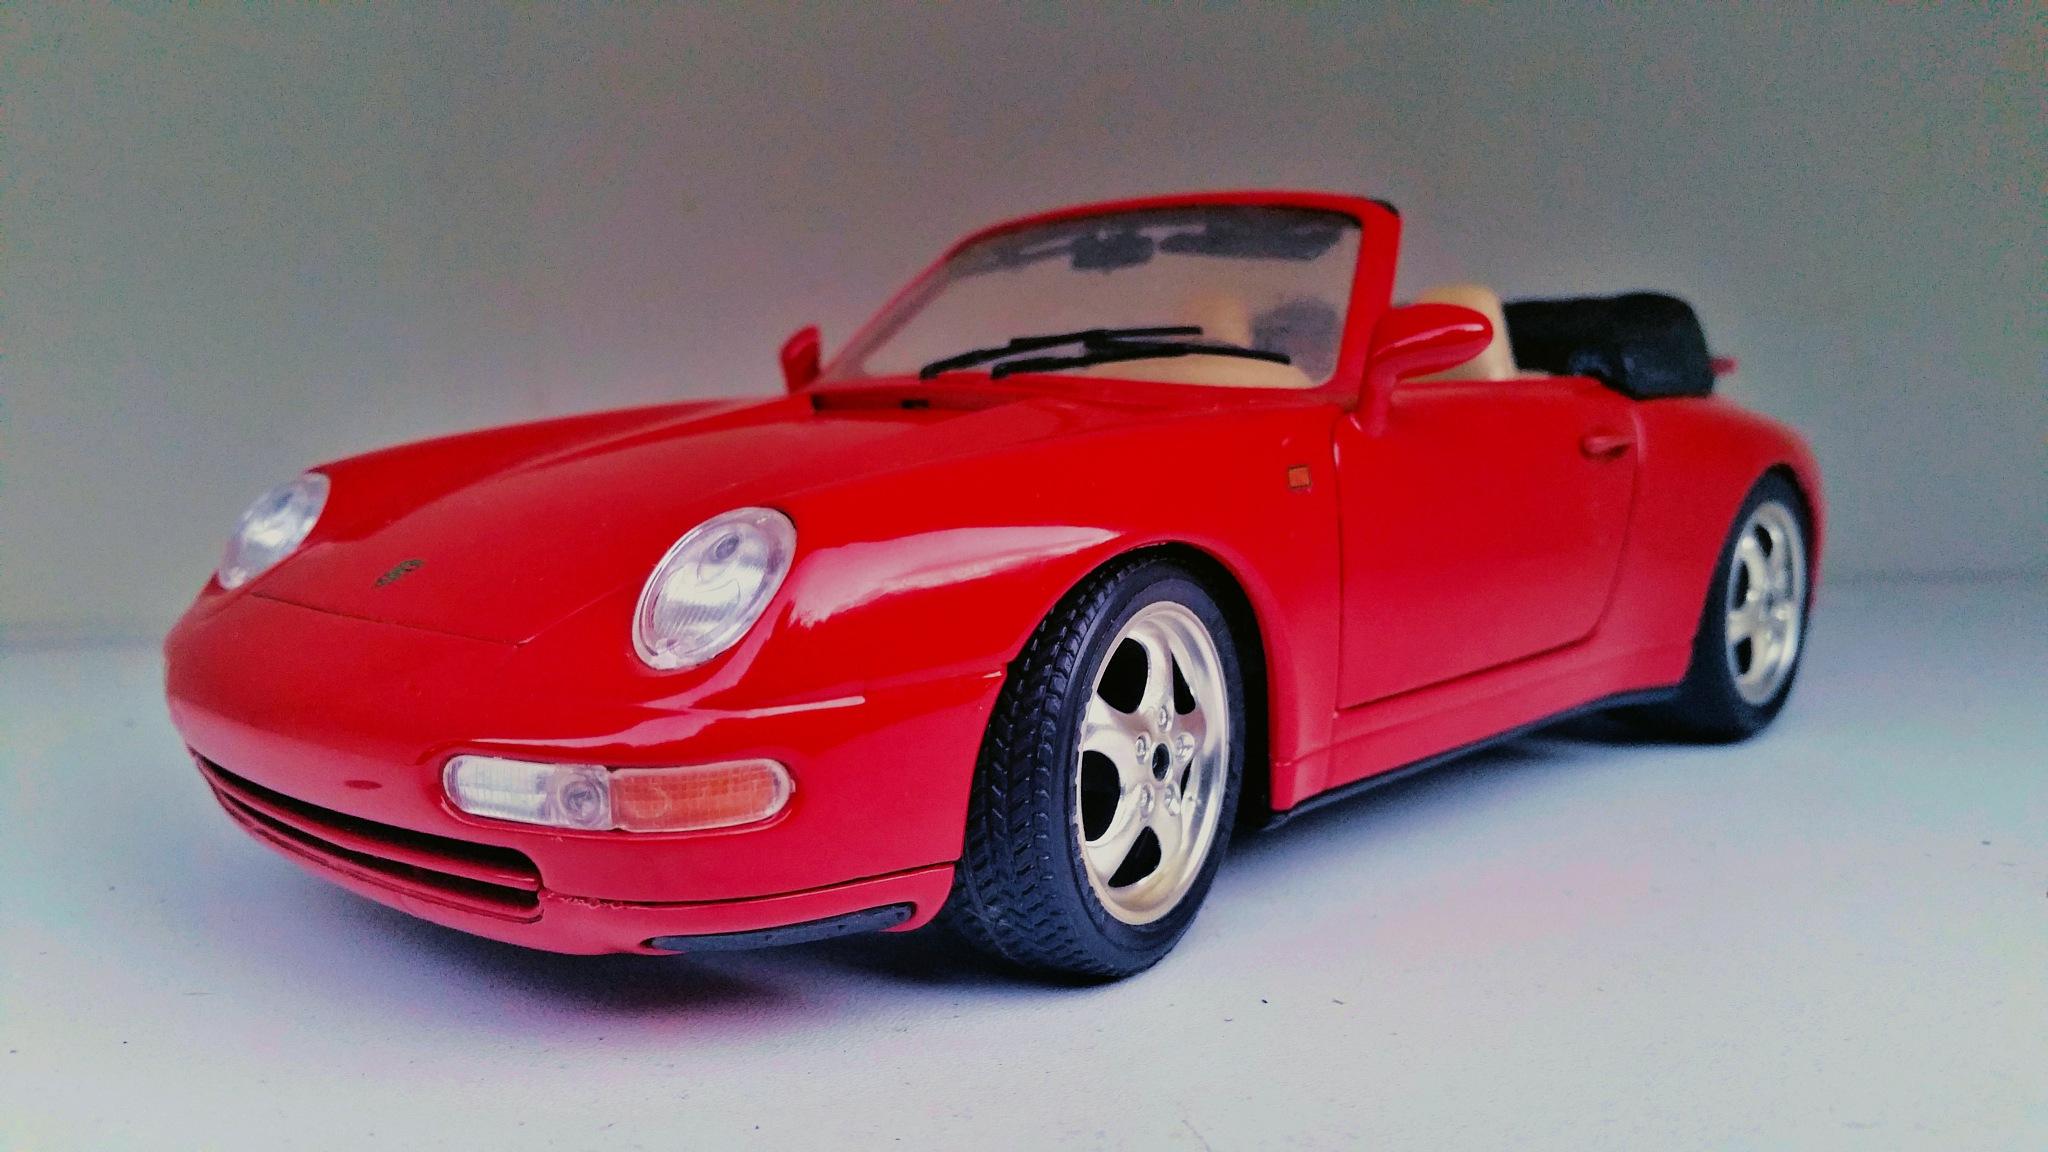 Porsche 911 by Almere photography